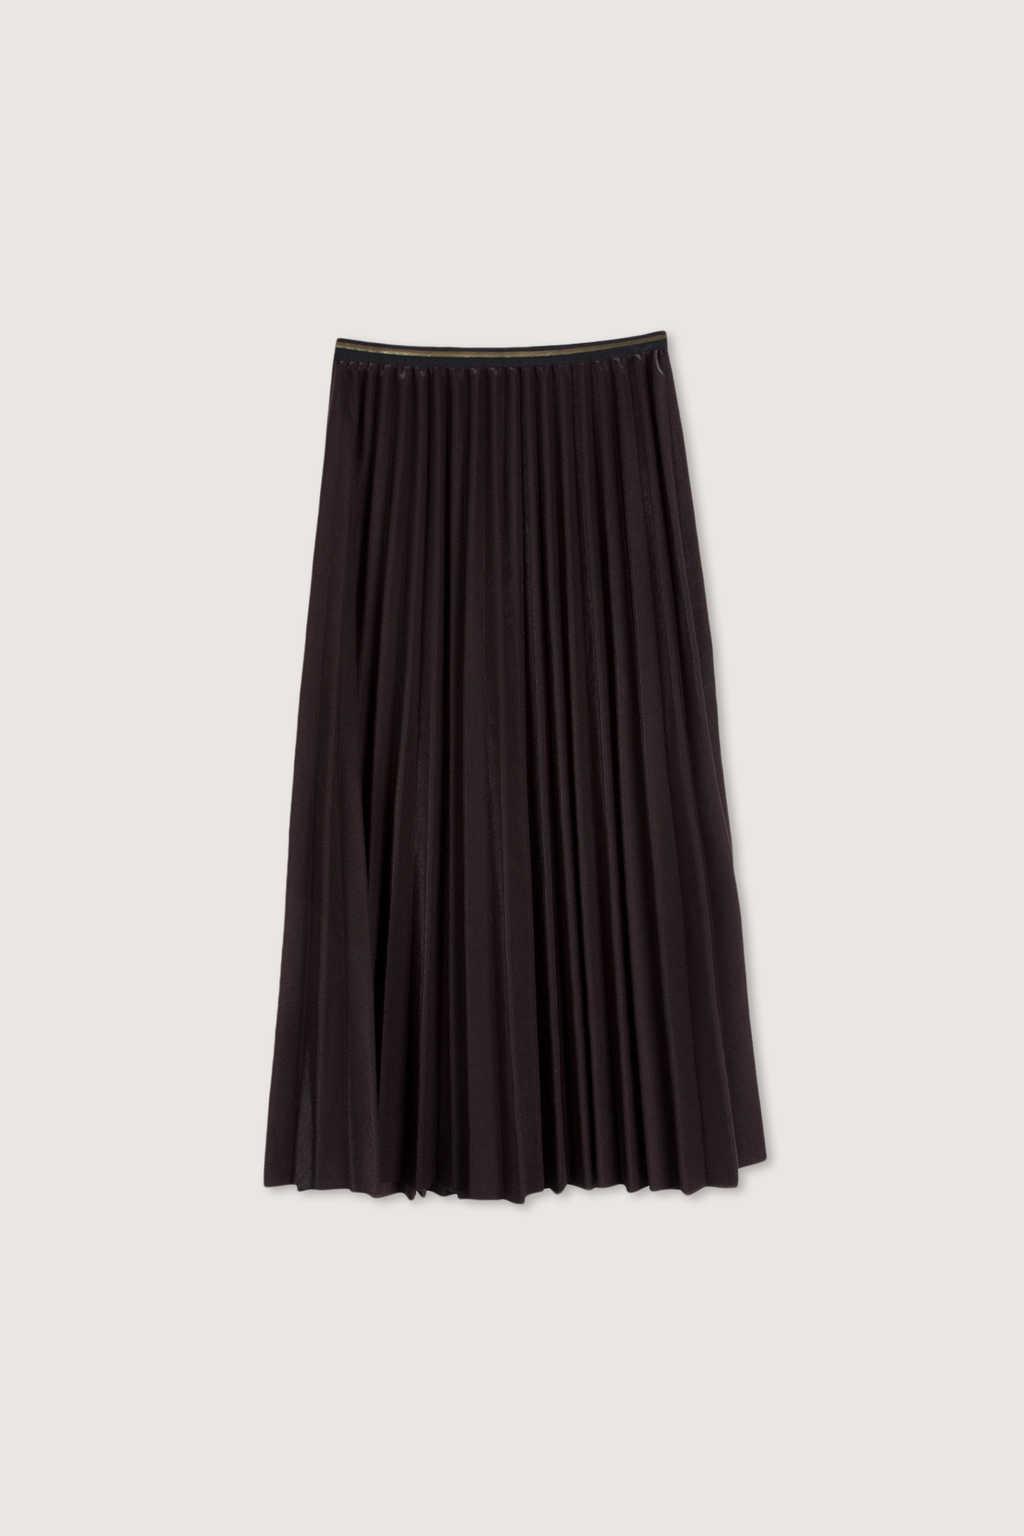 Skirt H180 Wine 5